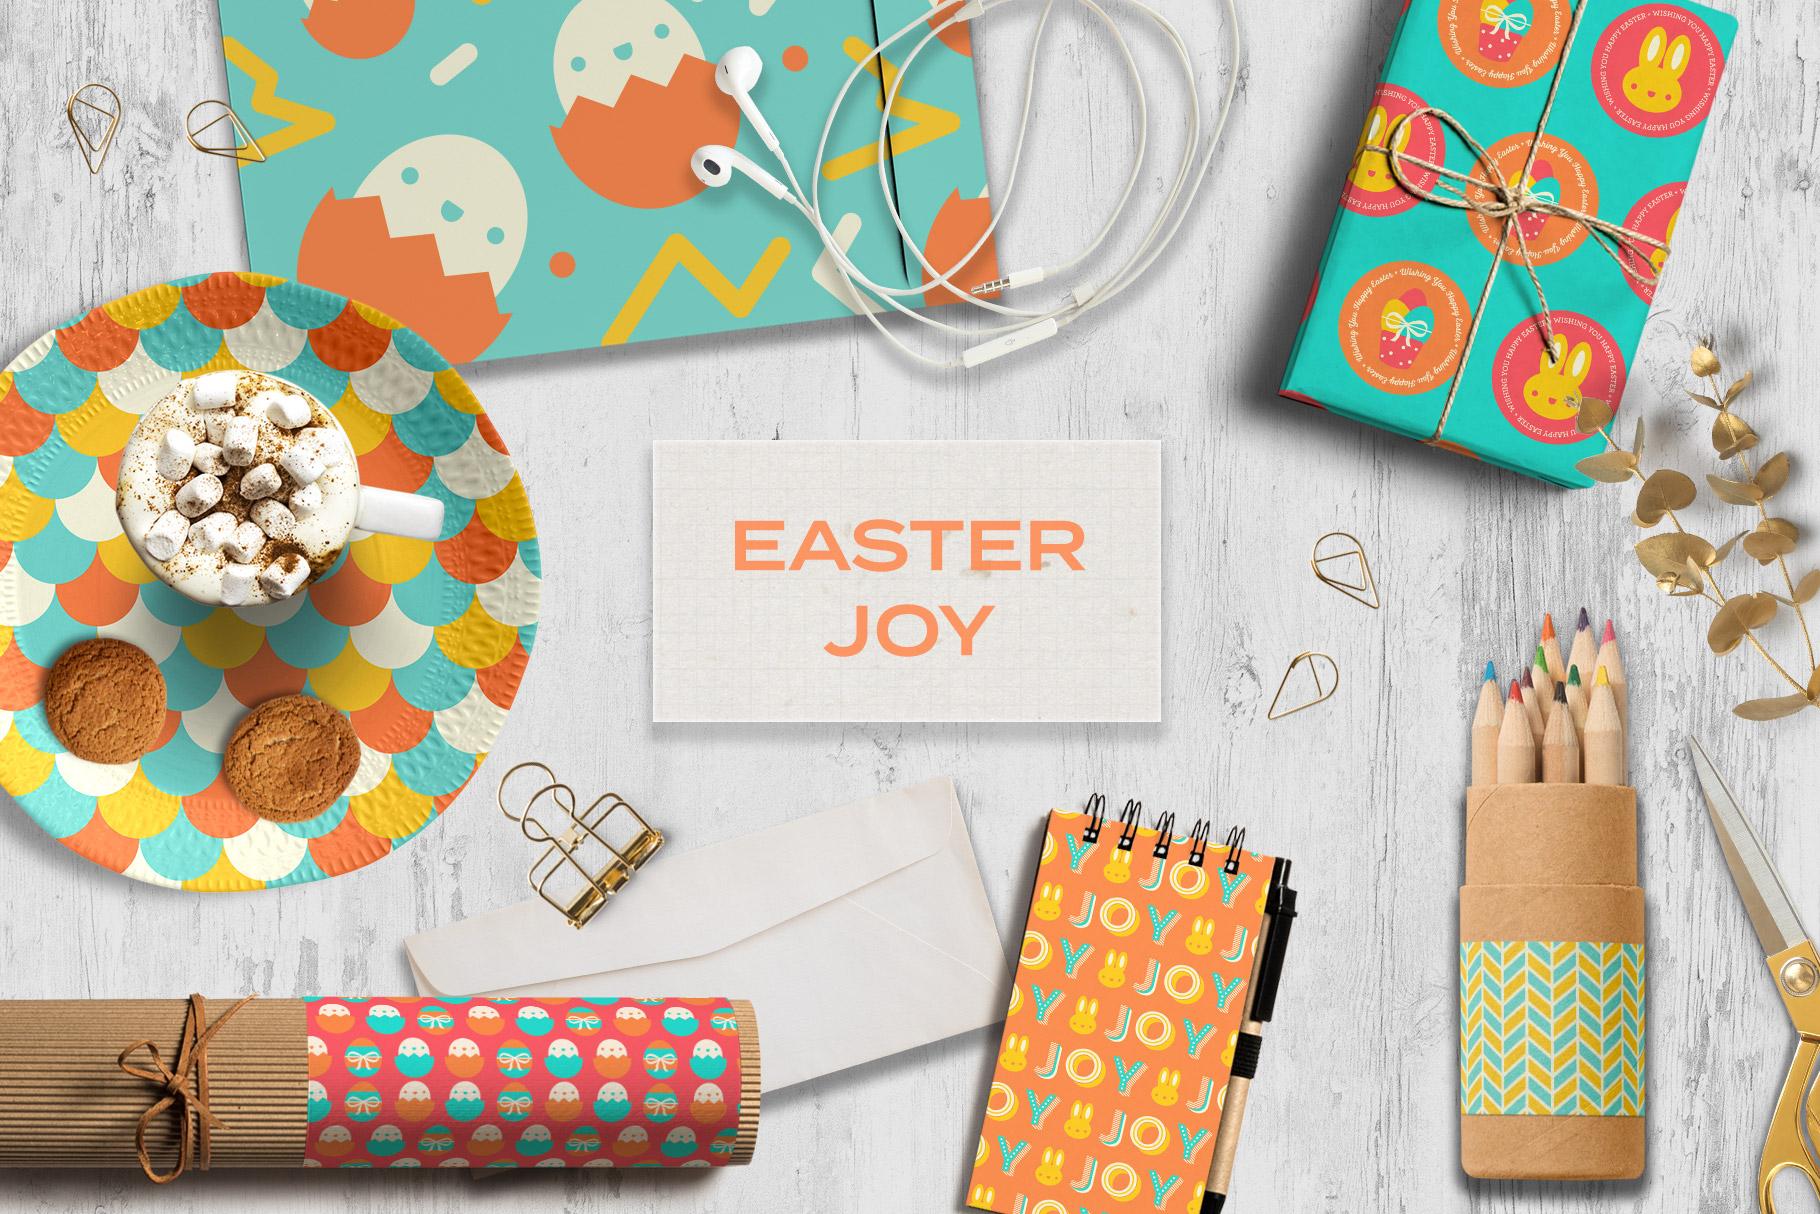 Easter Joy Patterns example image 2